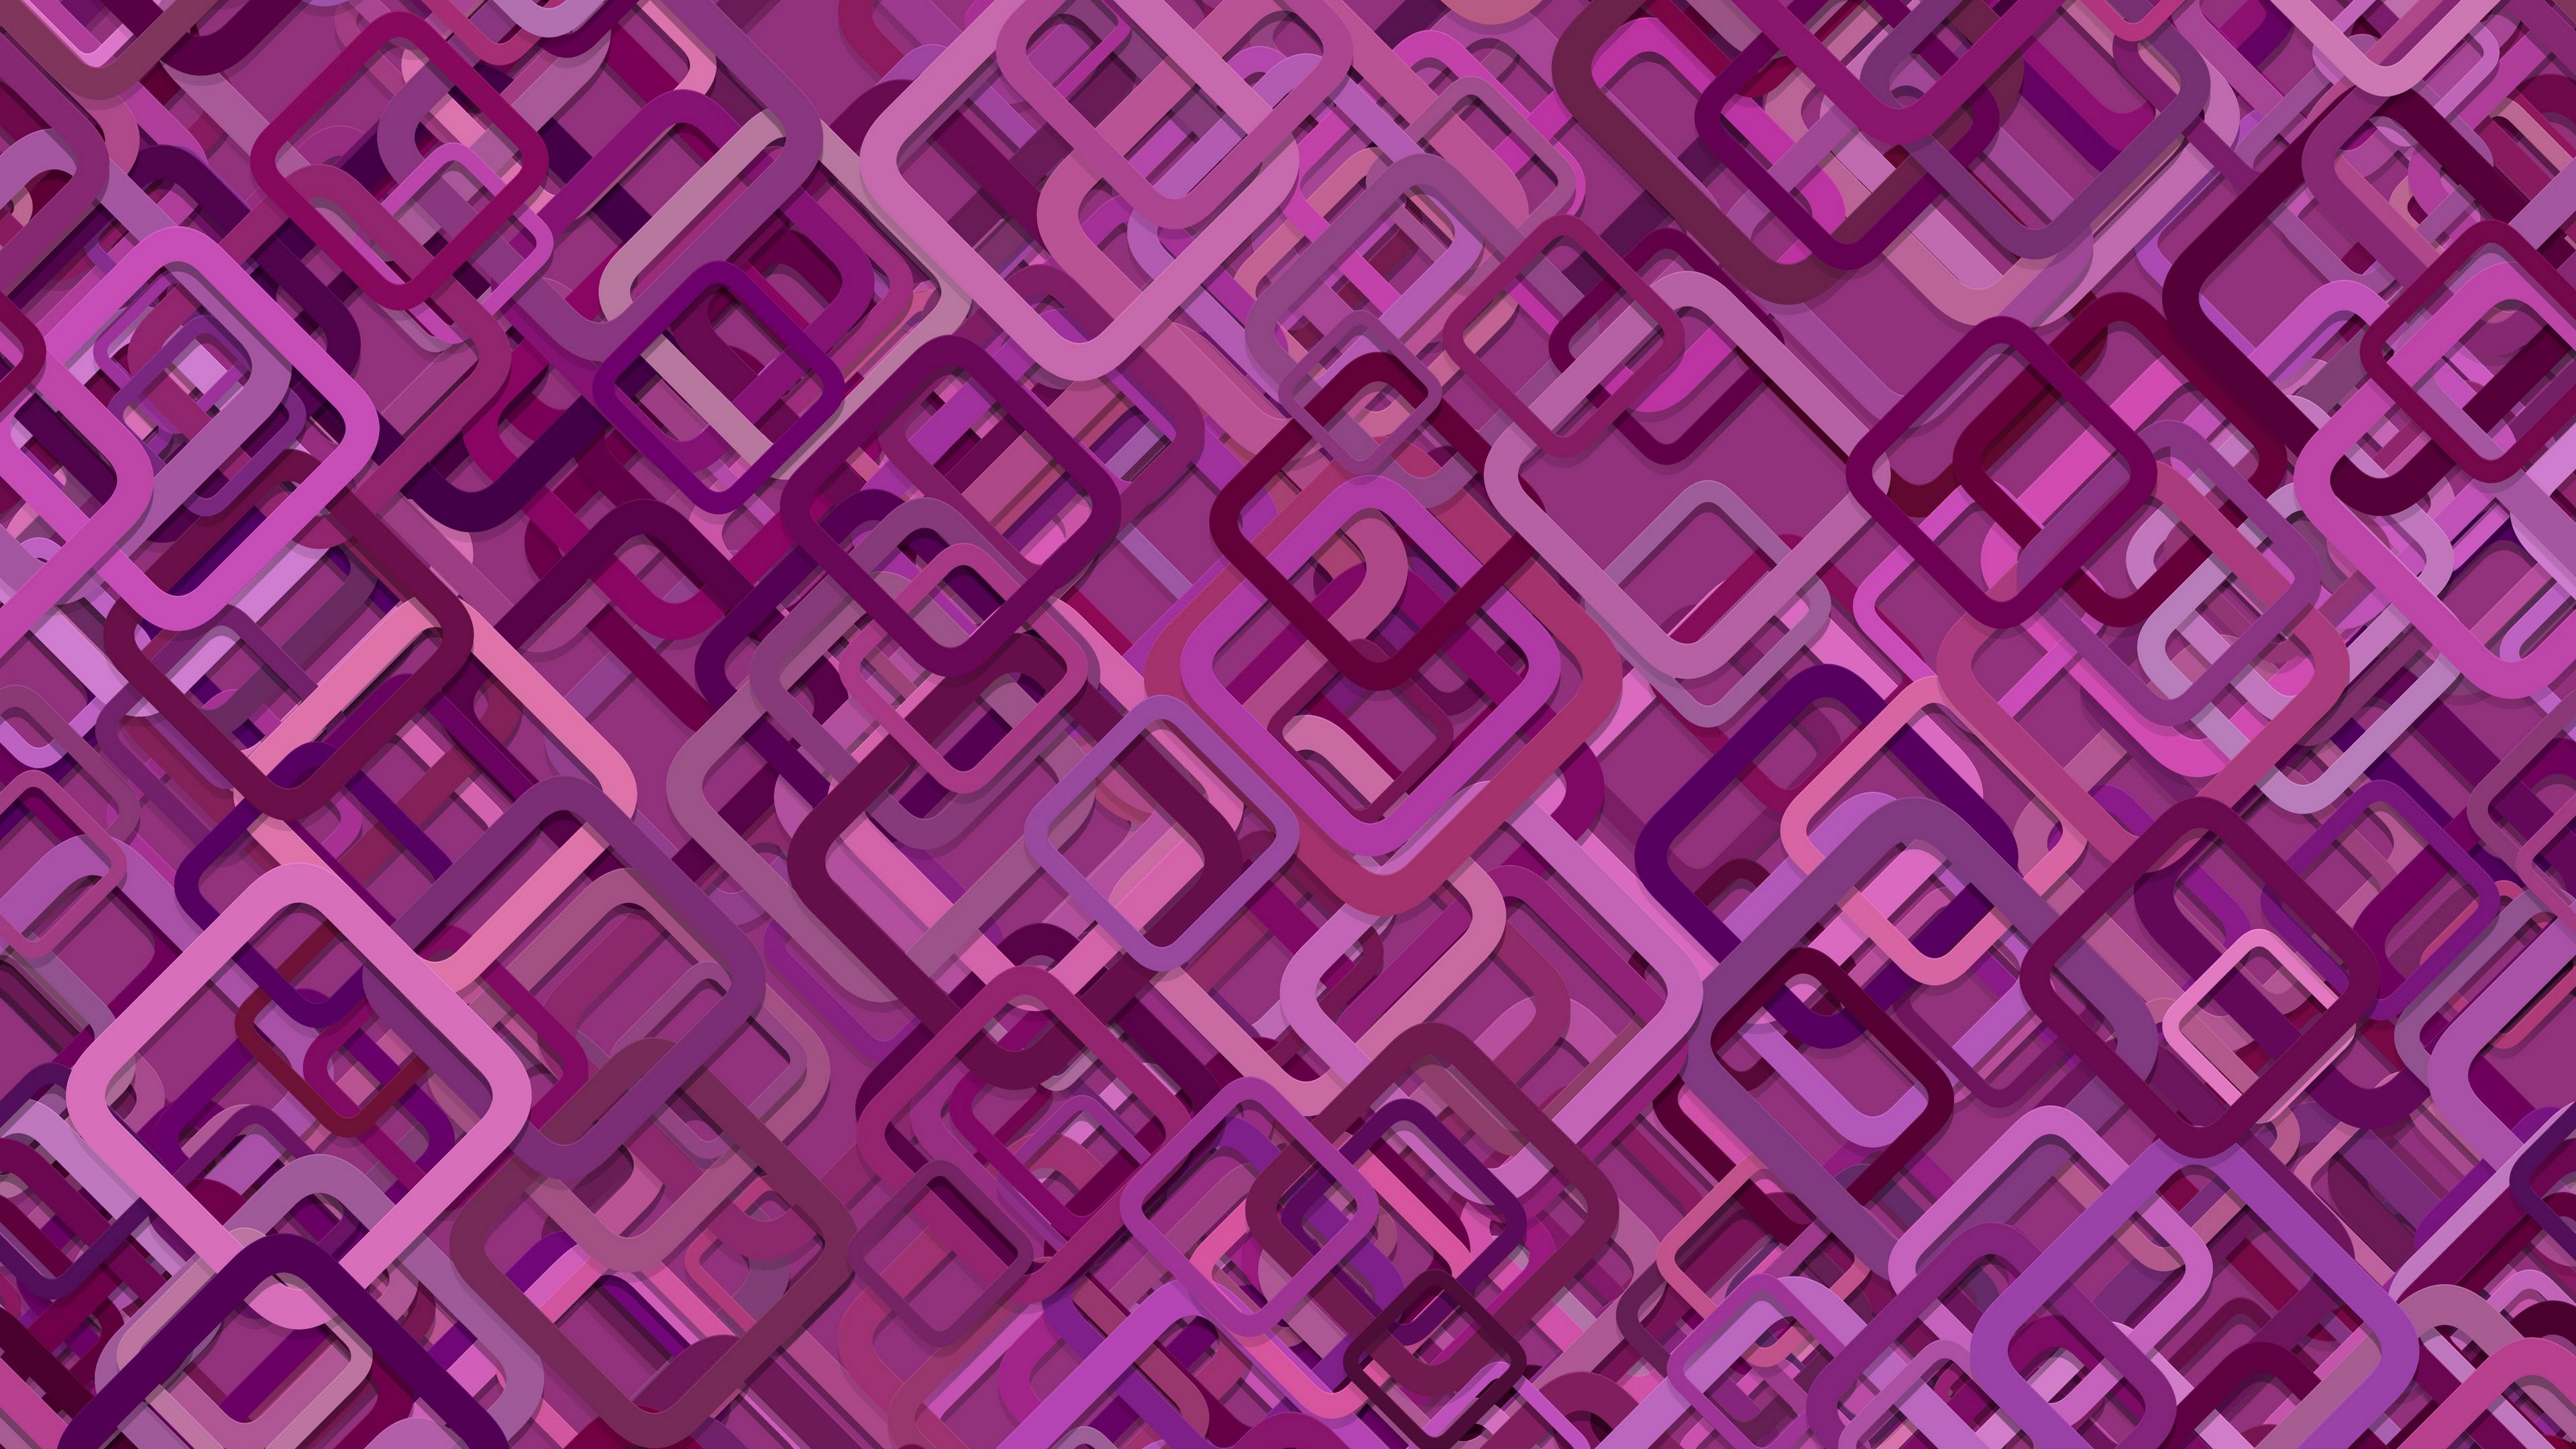 diagonals shapes purple 4k 1536097811 - diagonals, shapes, purple 4k - Shapes, Purple, diagonals